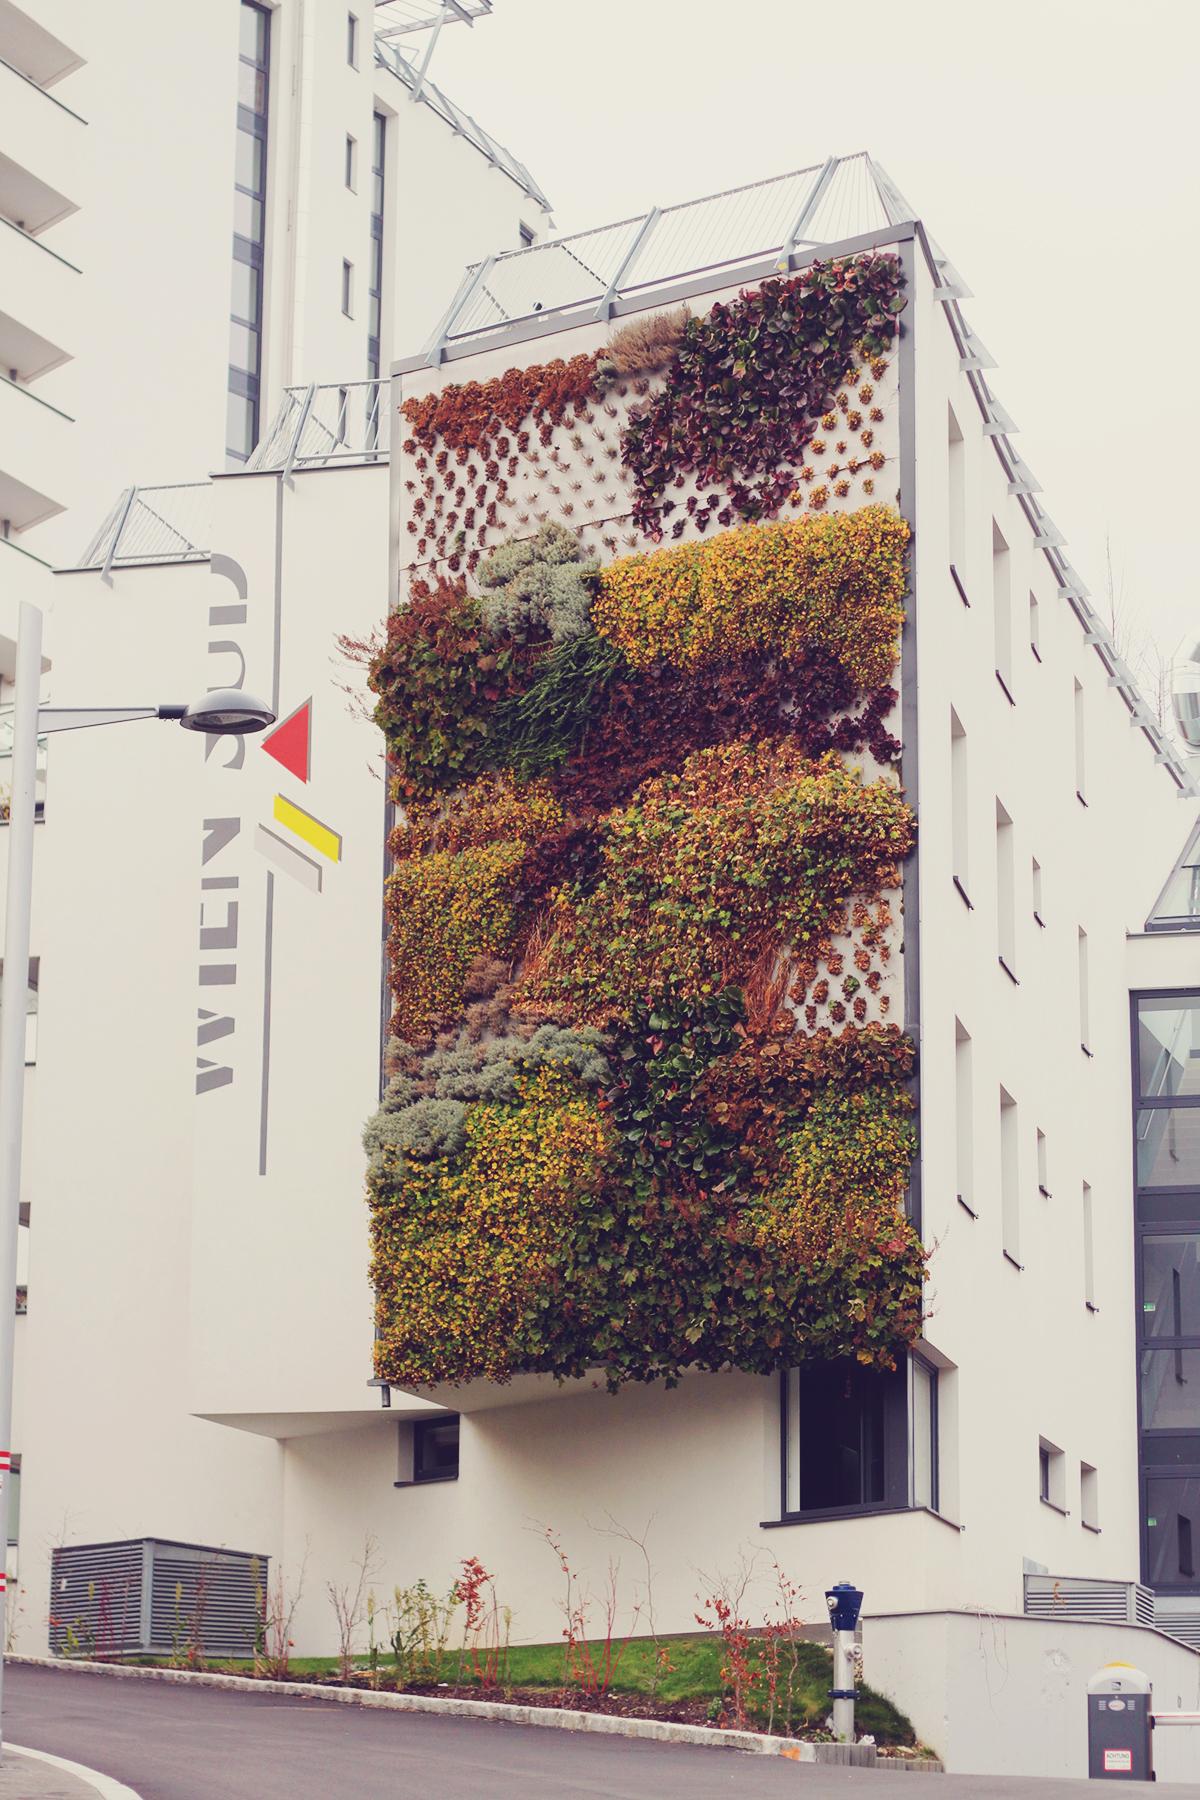 Vienna, travel, white building, plants